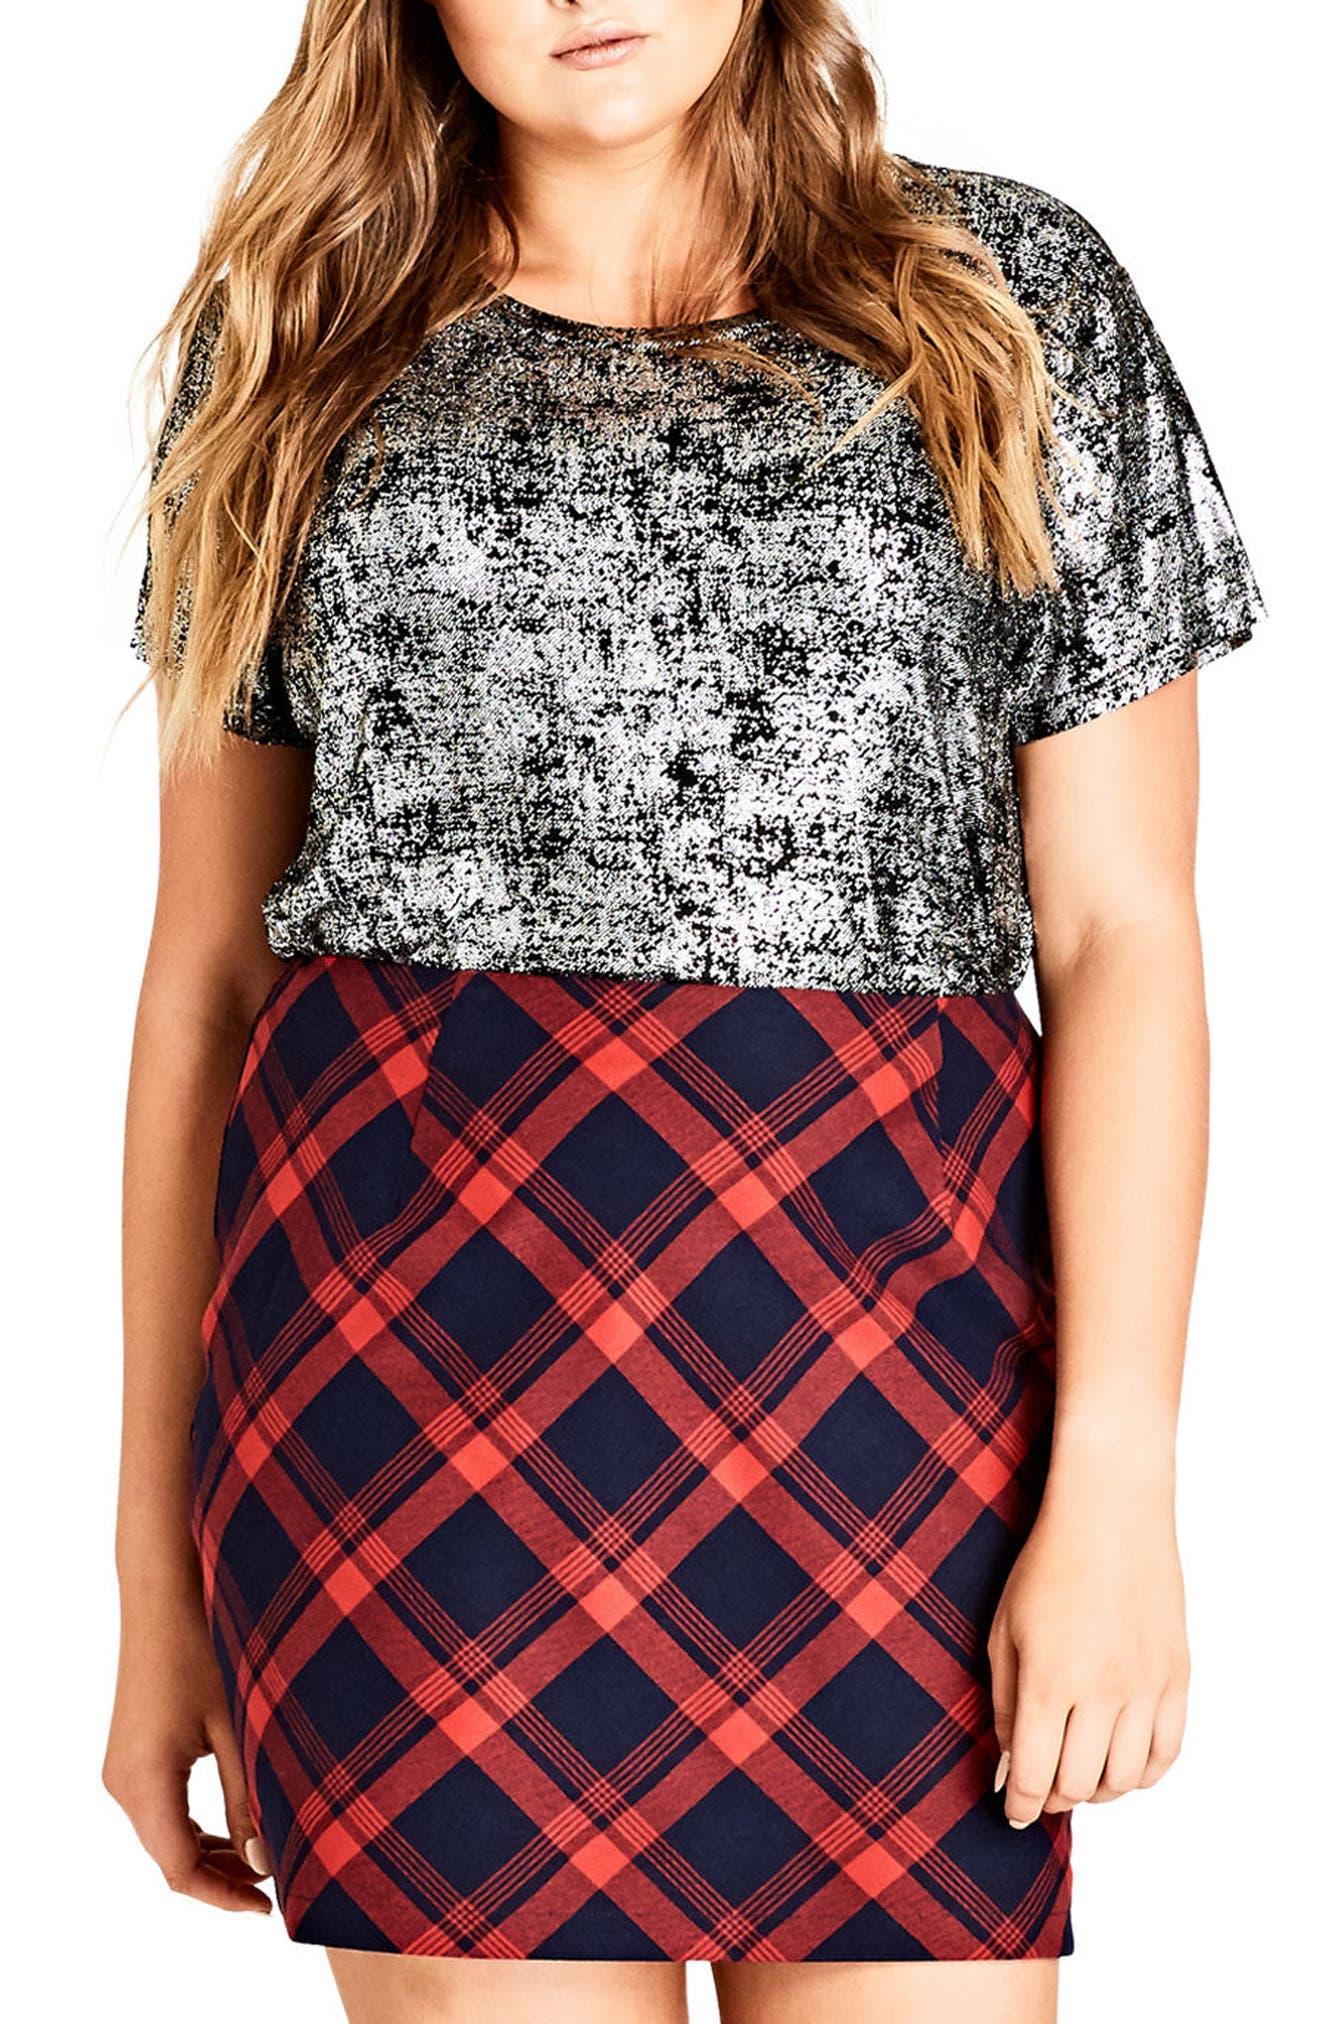 Check Mate Miniskirt,                             Main thumbnail 1, color,                             601